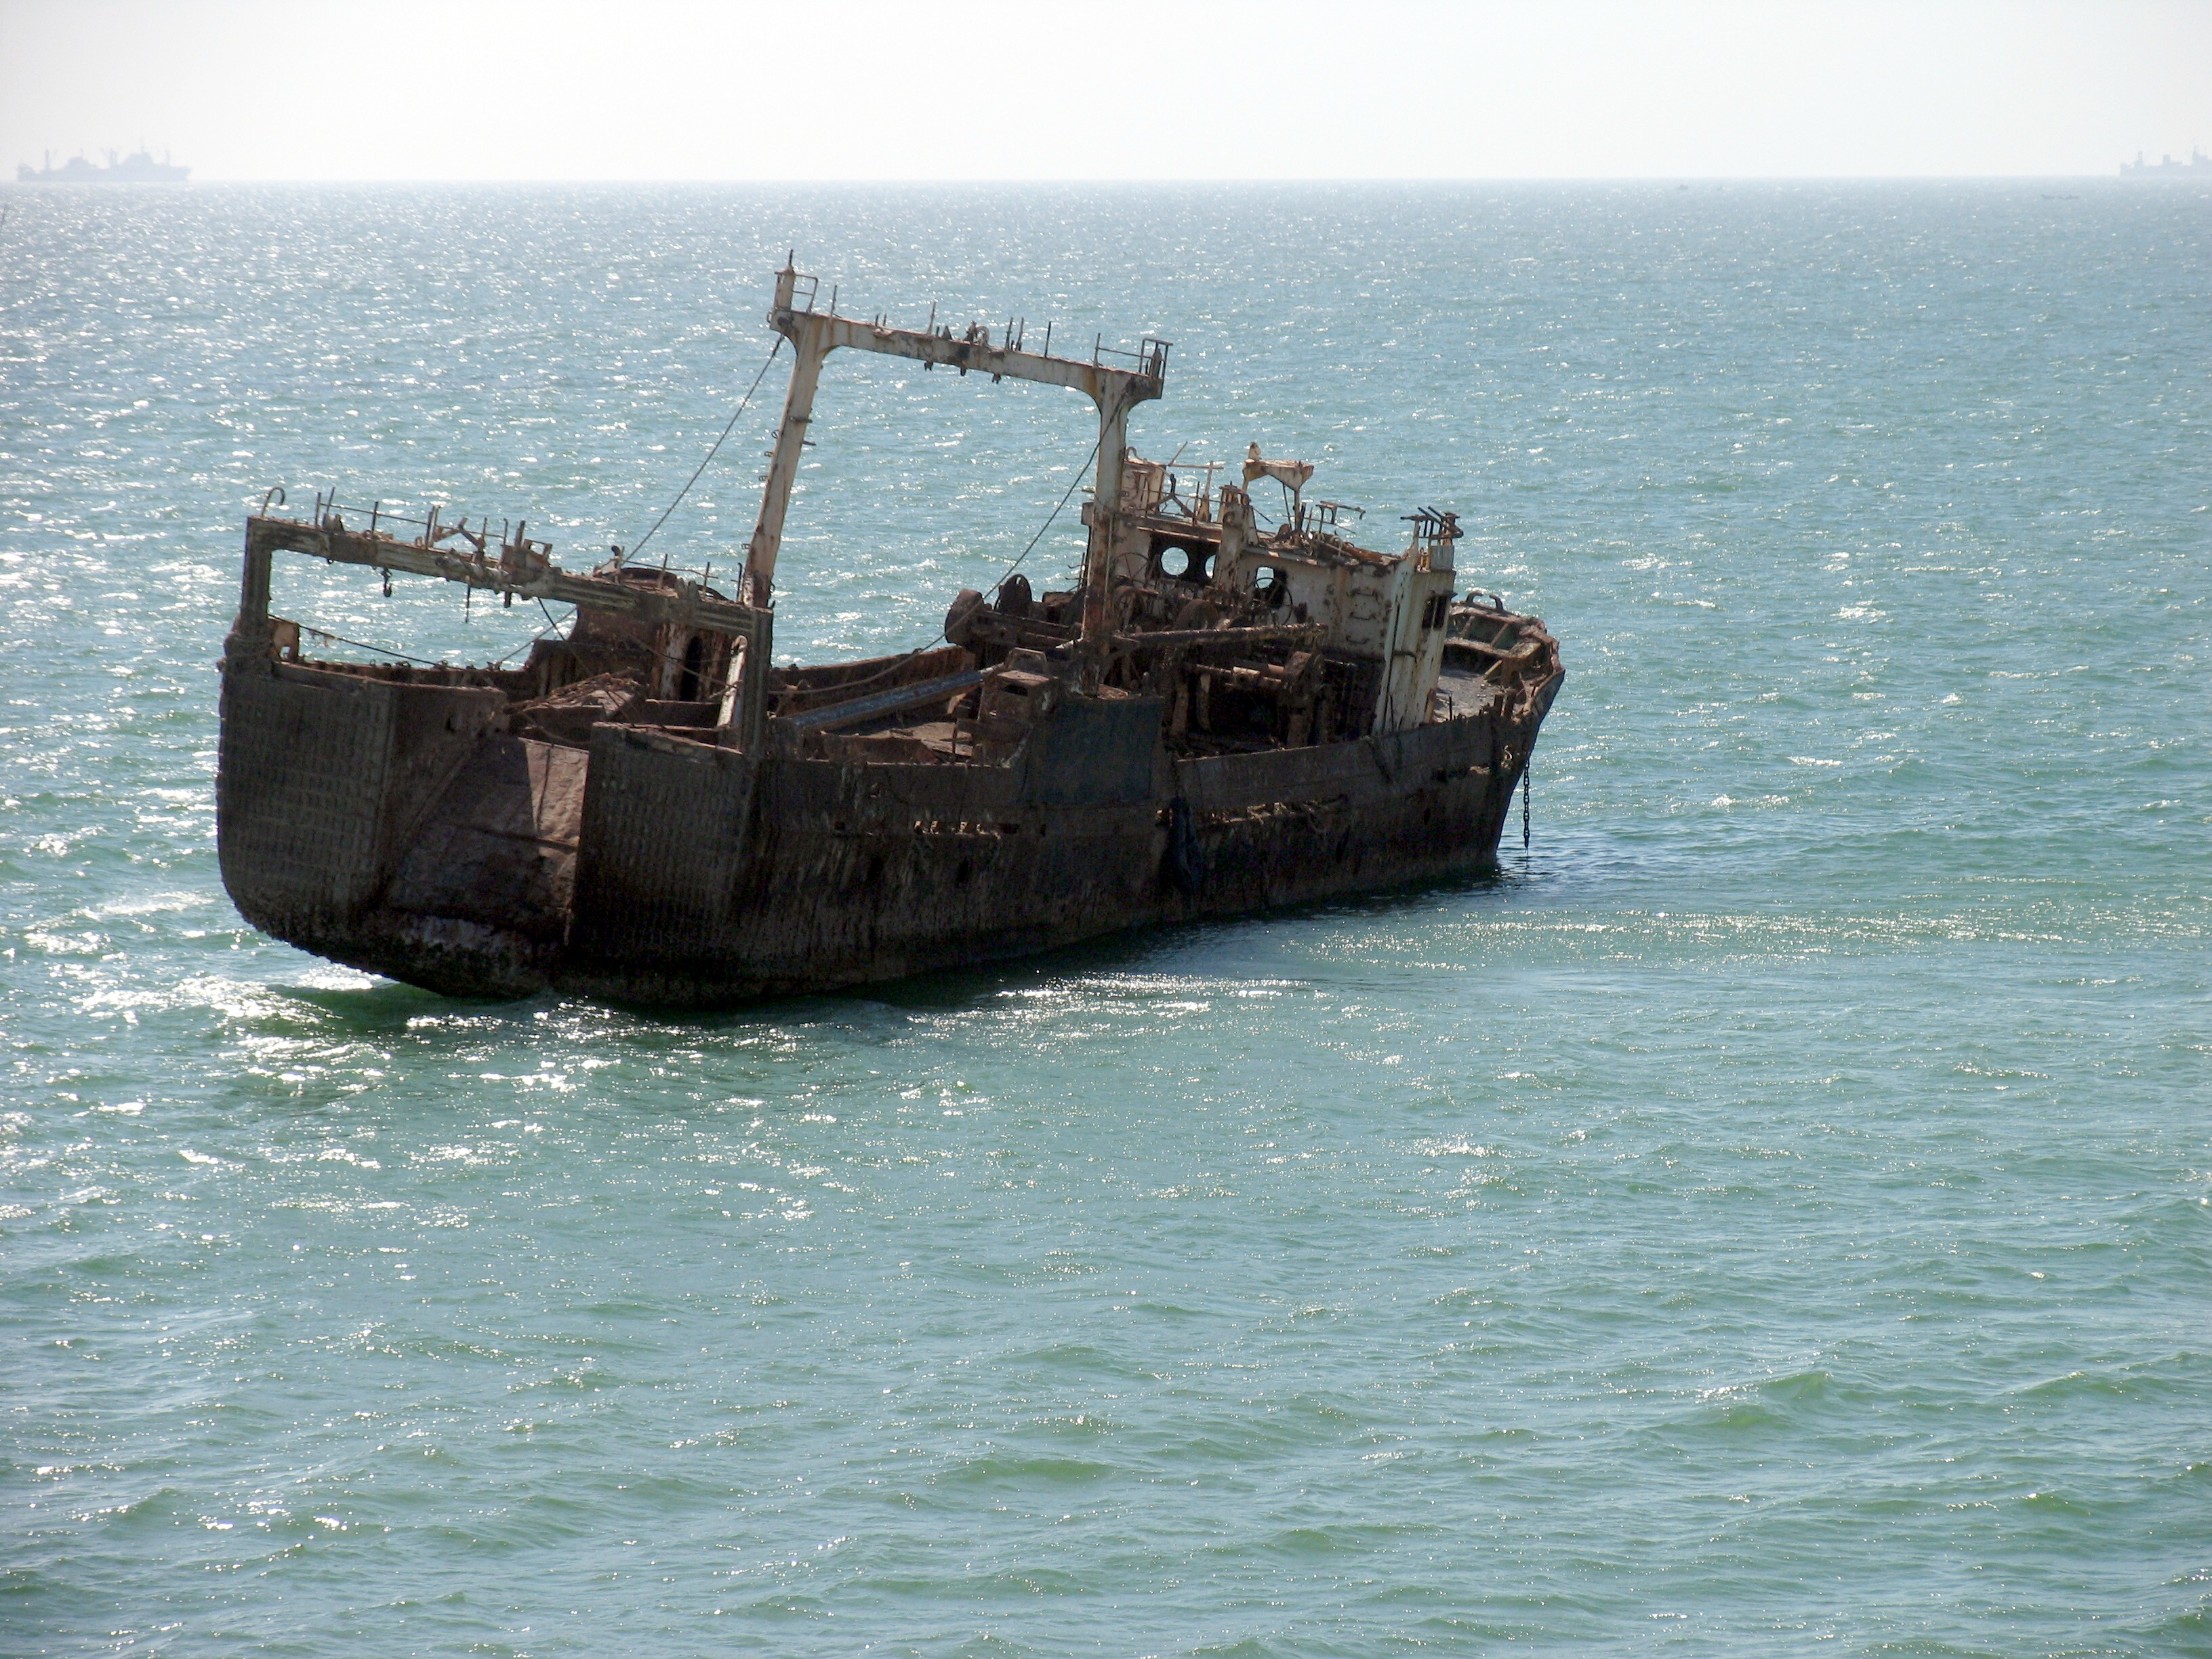 Largest Cargo Ship >> File:Ships graveyard, Nouadhibou, Mauritania-5.jpg - Wikimedia Commons